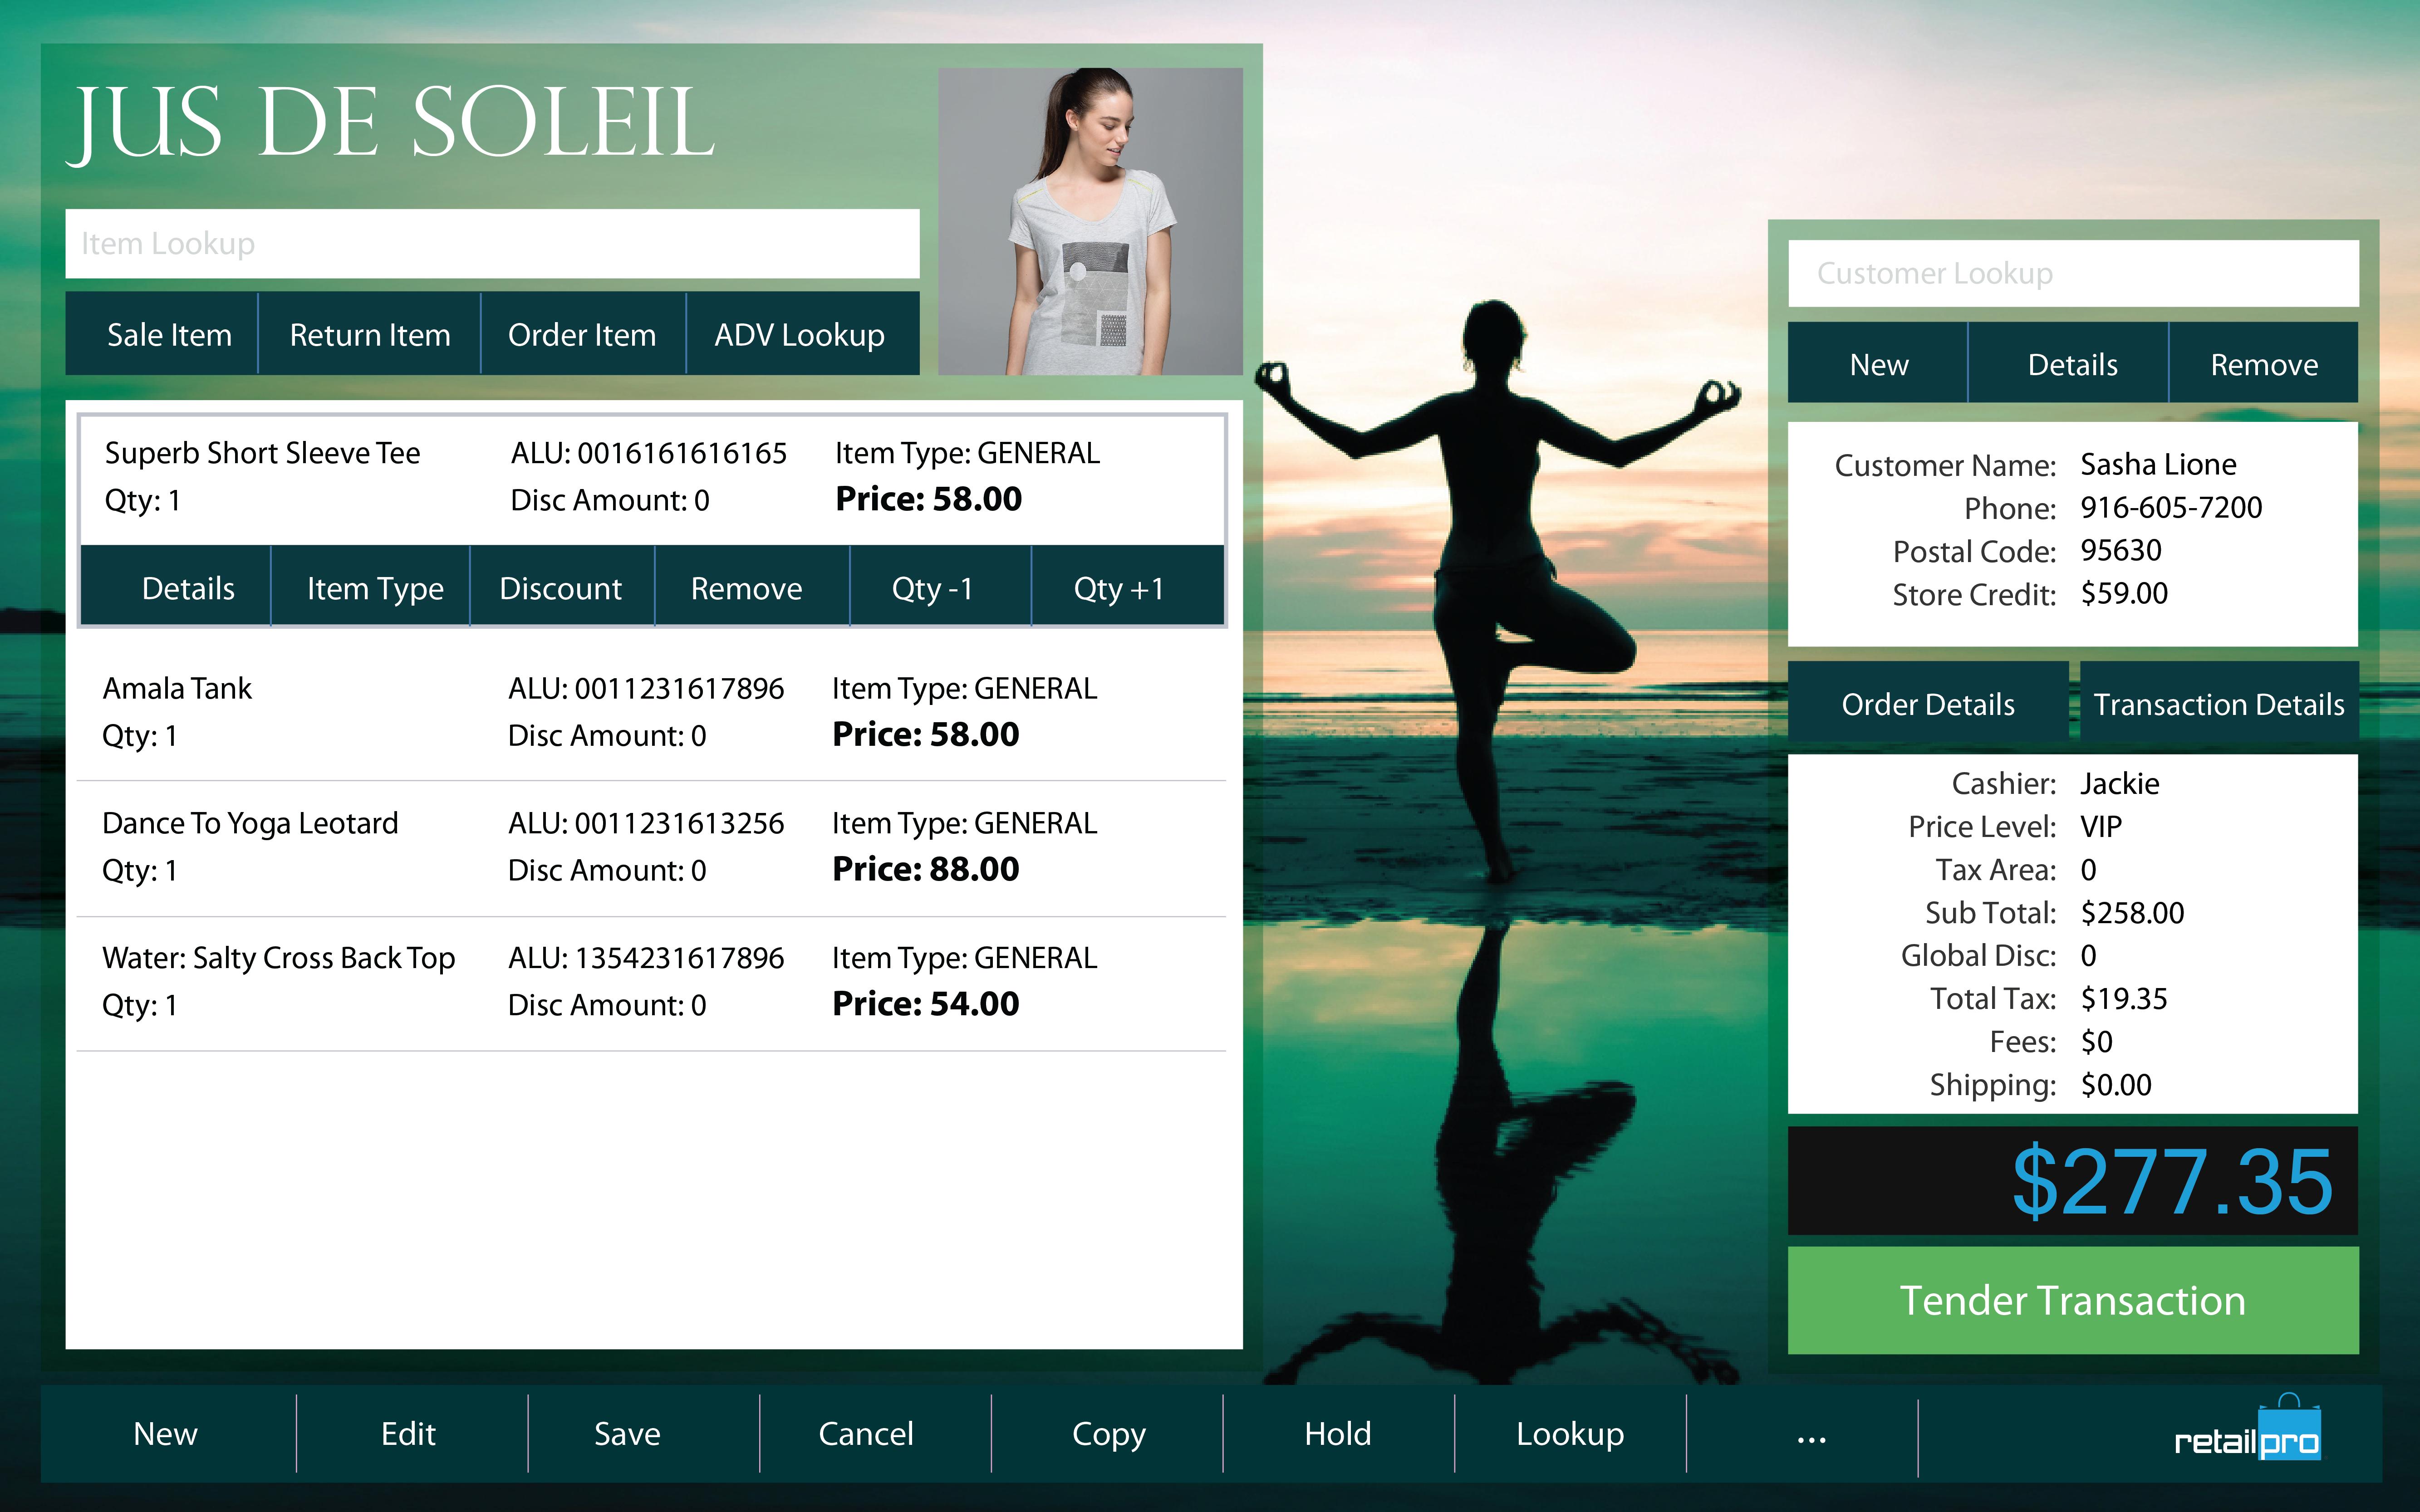 Website and POS branding capabilities